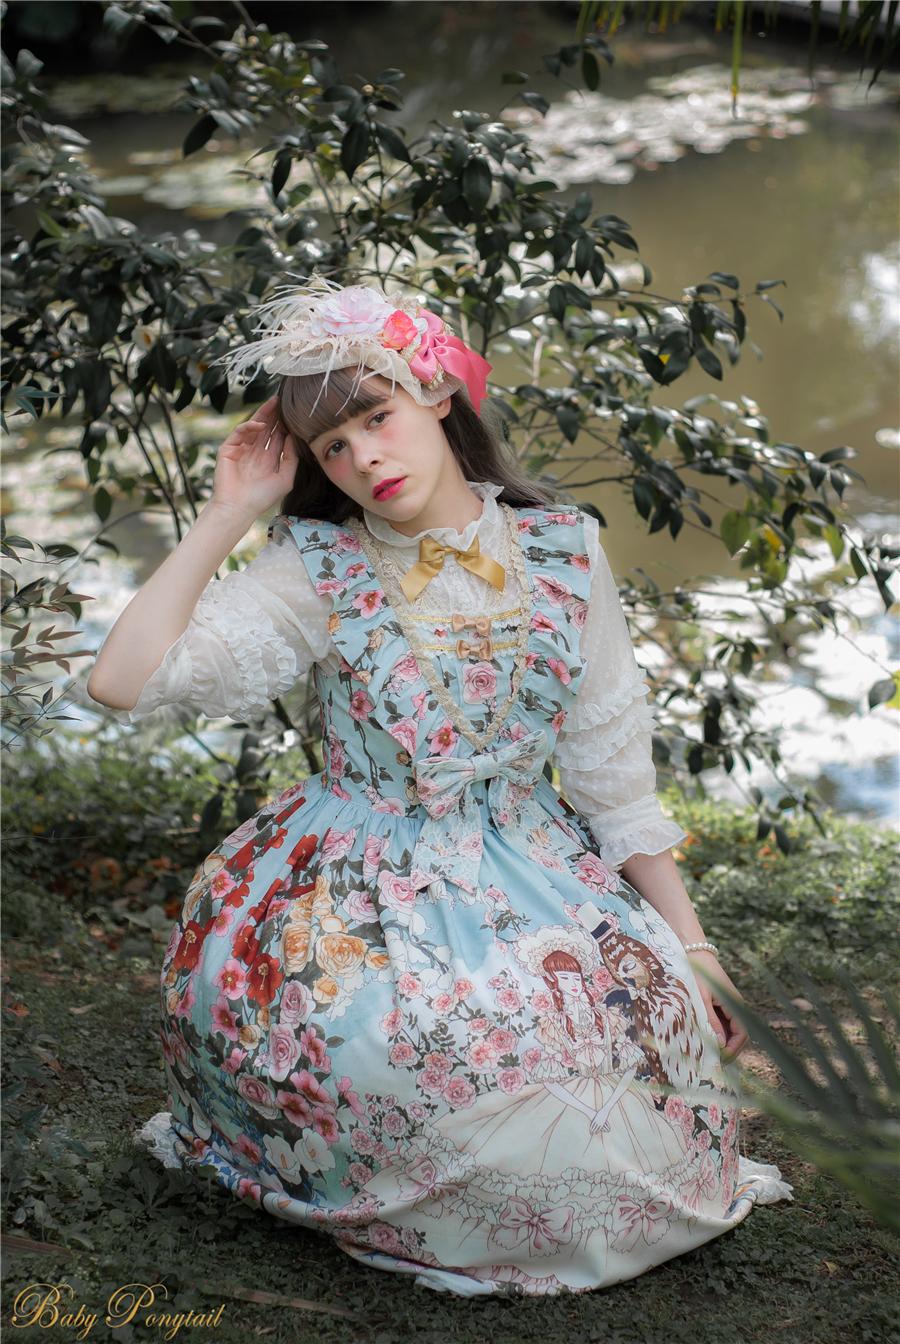 Baby Ponytail_Model Photo_Polly's Garden of Dreams_JSK Sky_Claudia13.jpg